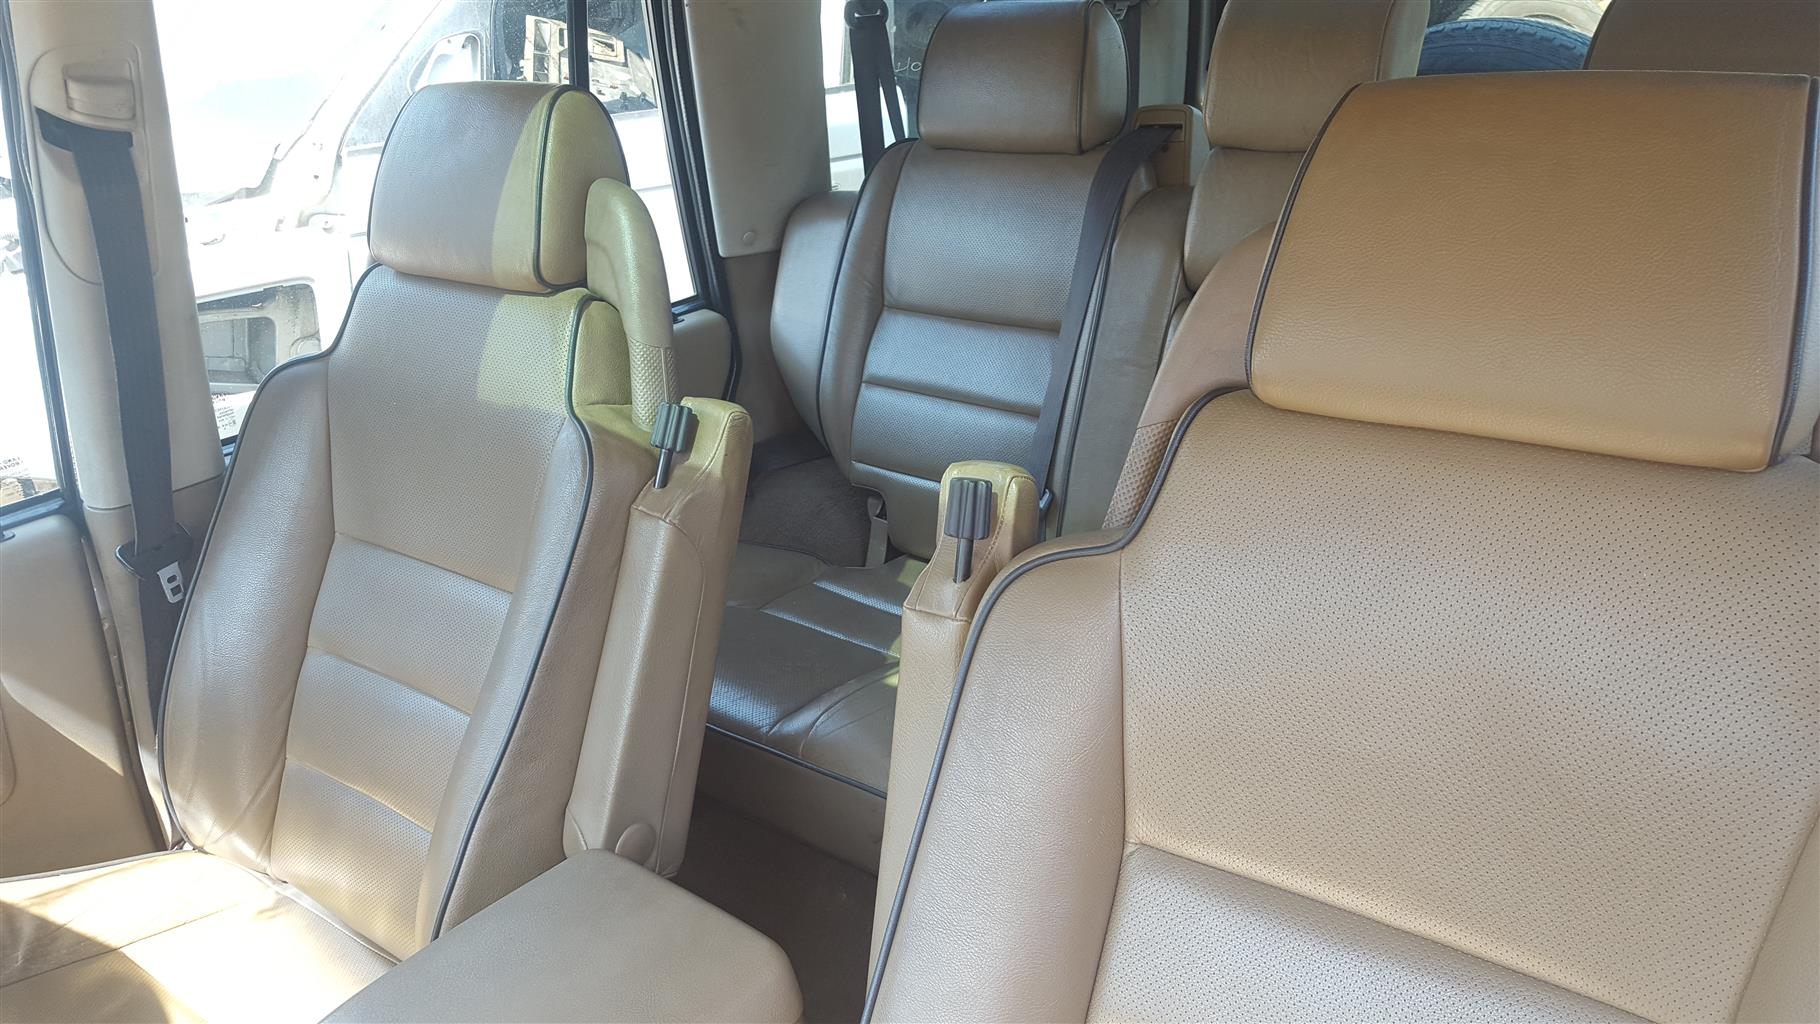 Land Rover Discovery 2 TD5 Seats | Auto Ezi